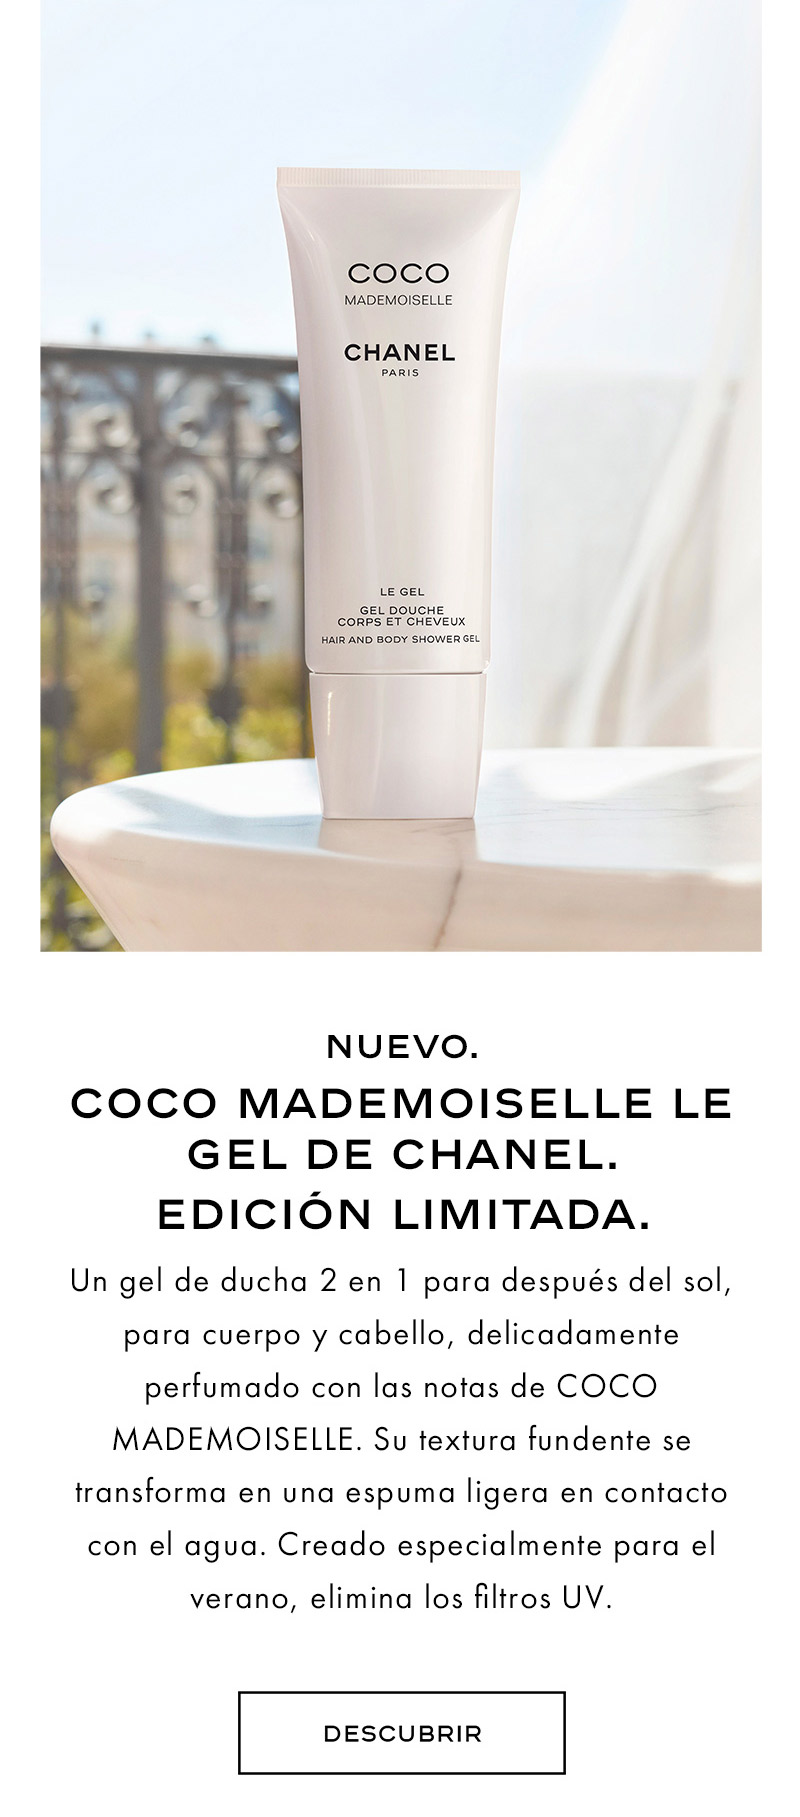 COCO MADEMOISELLE COLLECTION ÉTÉ